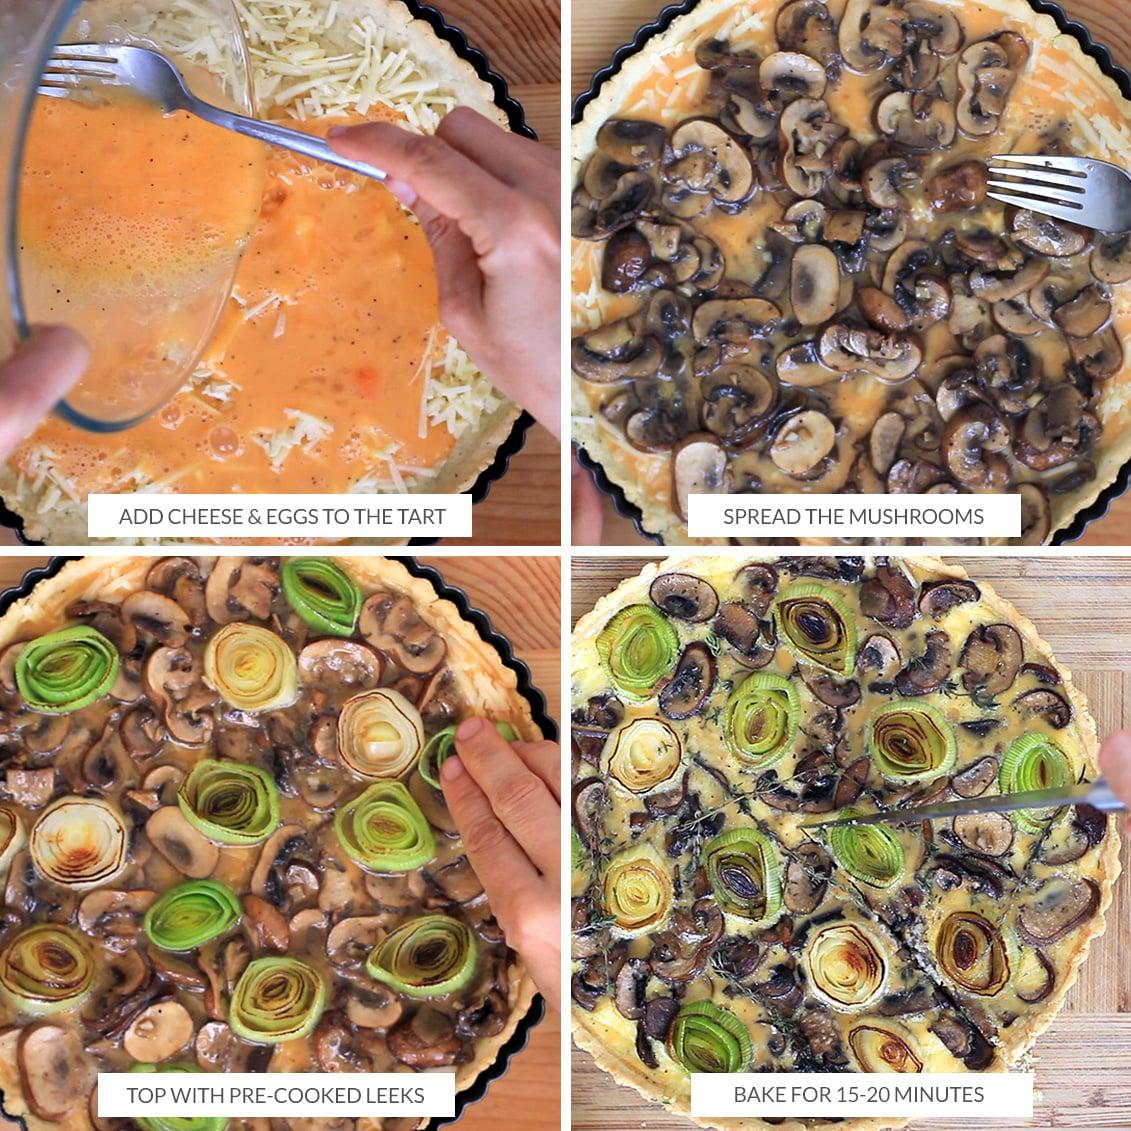 How to assemble and bake the mushroom tart